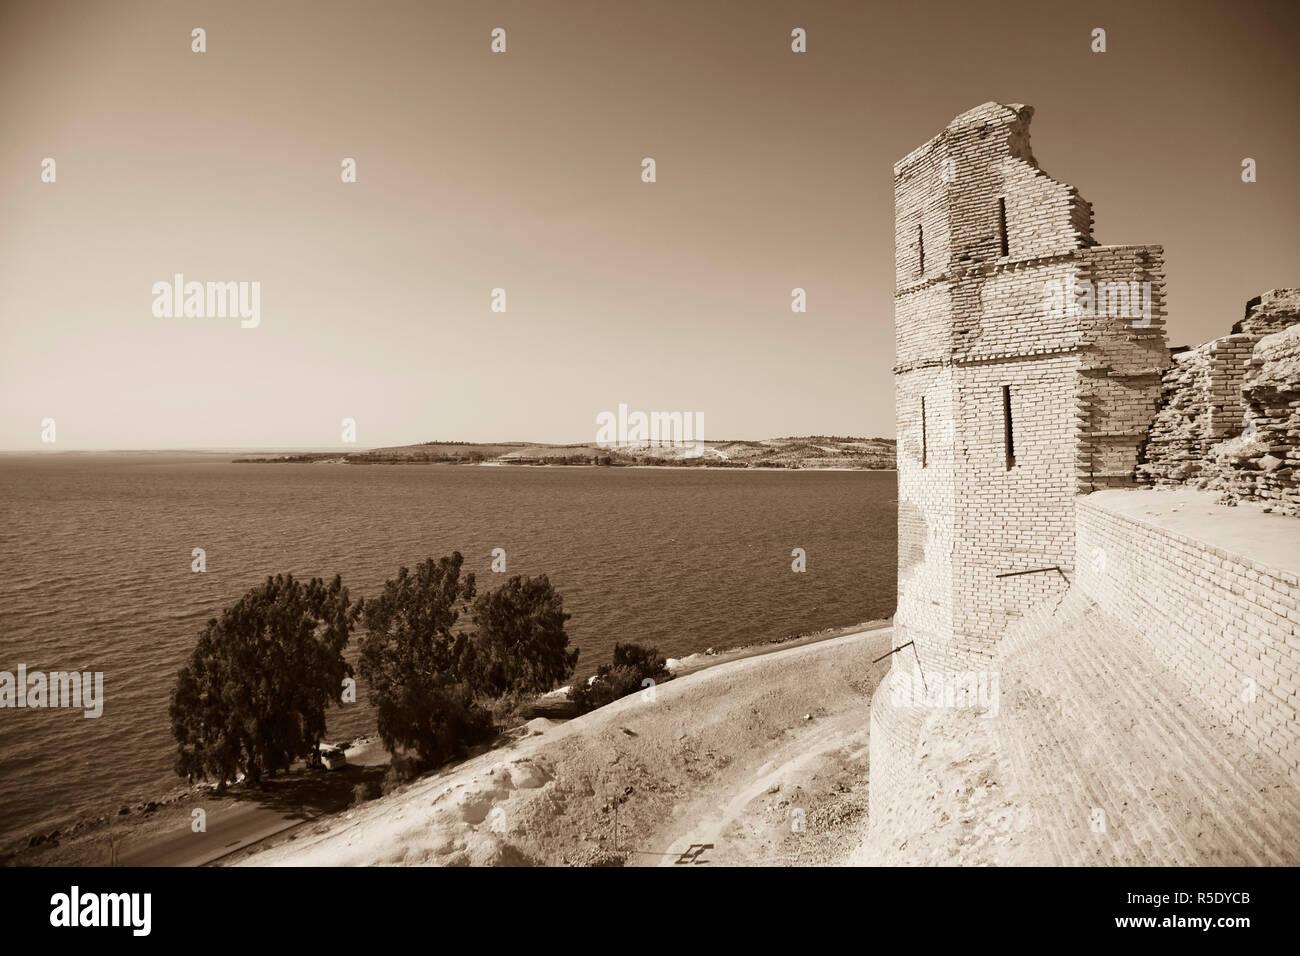 Syria, Euphrates river , Ath Thaura, Lake Al-Assad and Qalaat Jaabar Castle Stock Photo